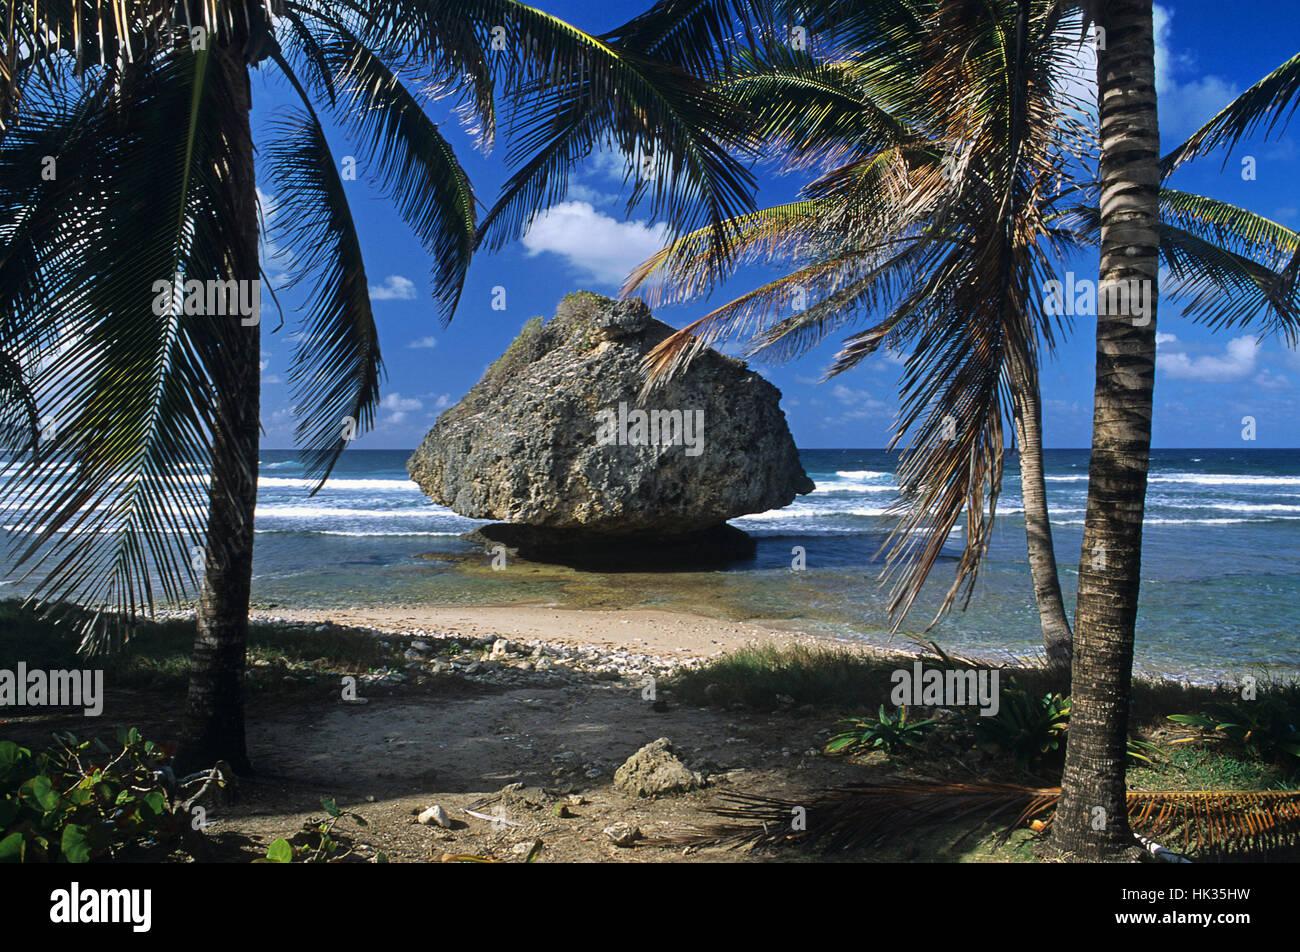 Dream-like Bathsheba beach, Barbados, Caribbean - Stock Image